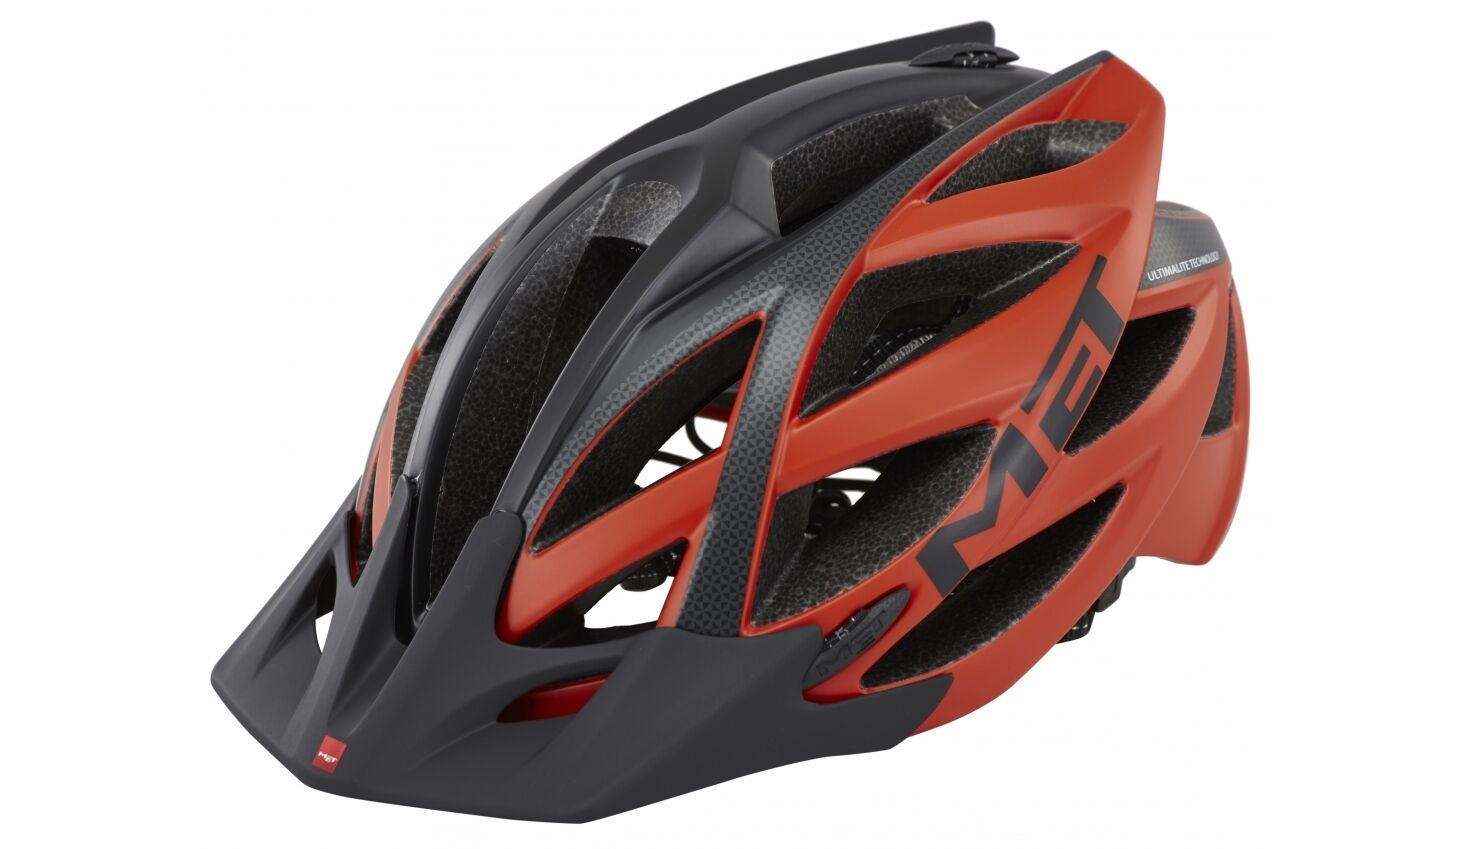 Casco Bici MET KAOS Mod. UL red black MATE HELMET MET kaos RED black Mate